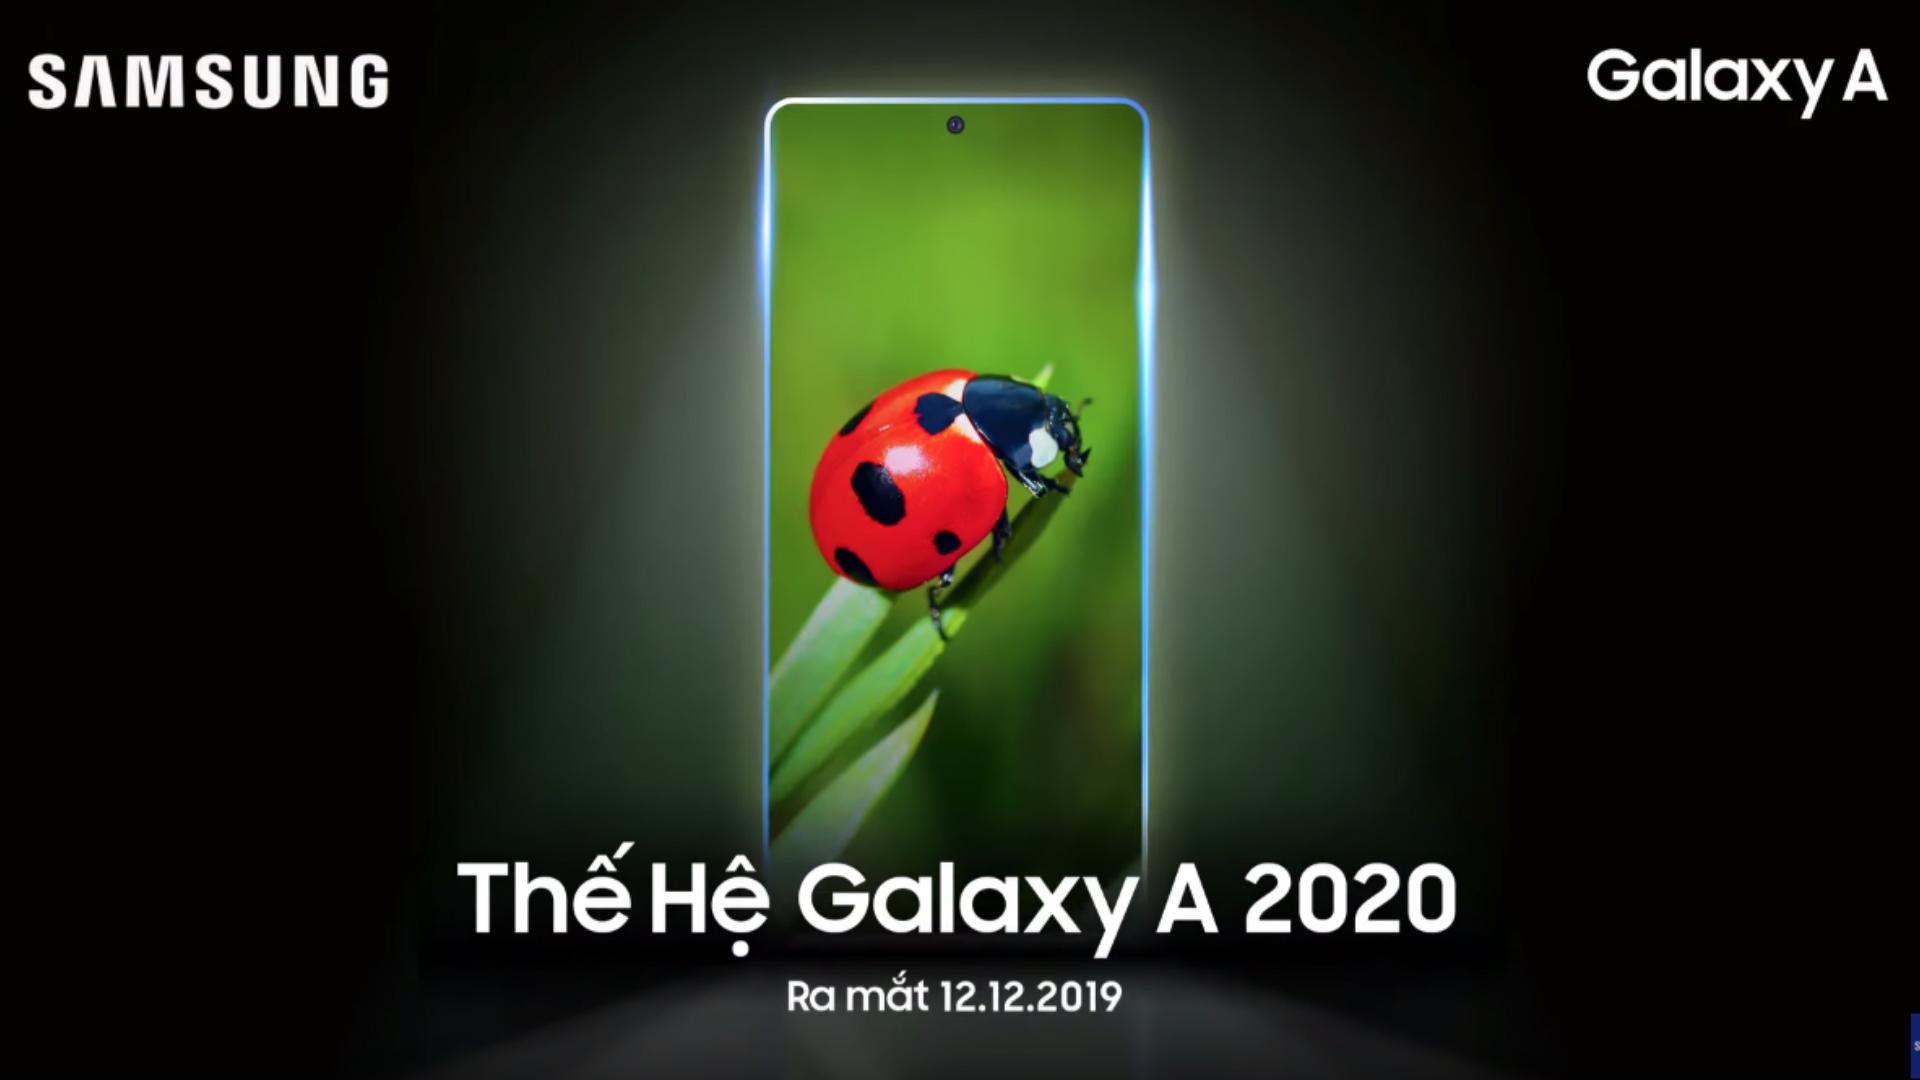 Samsung Galaxy A 2020 series teaser